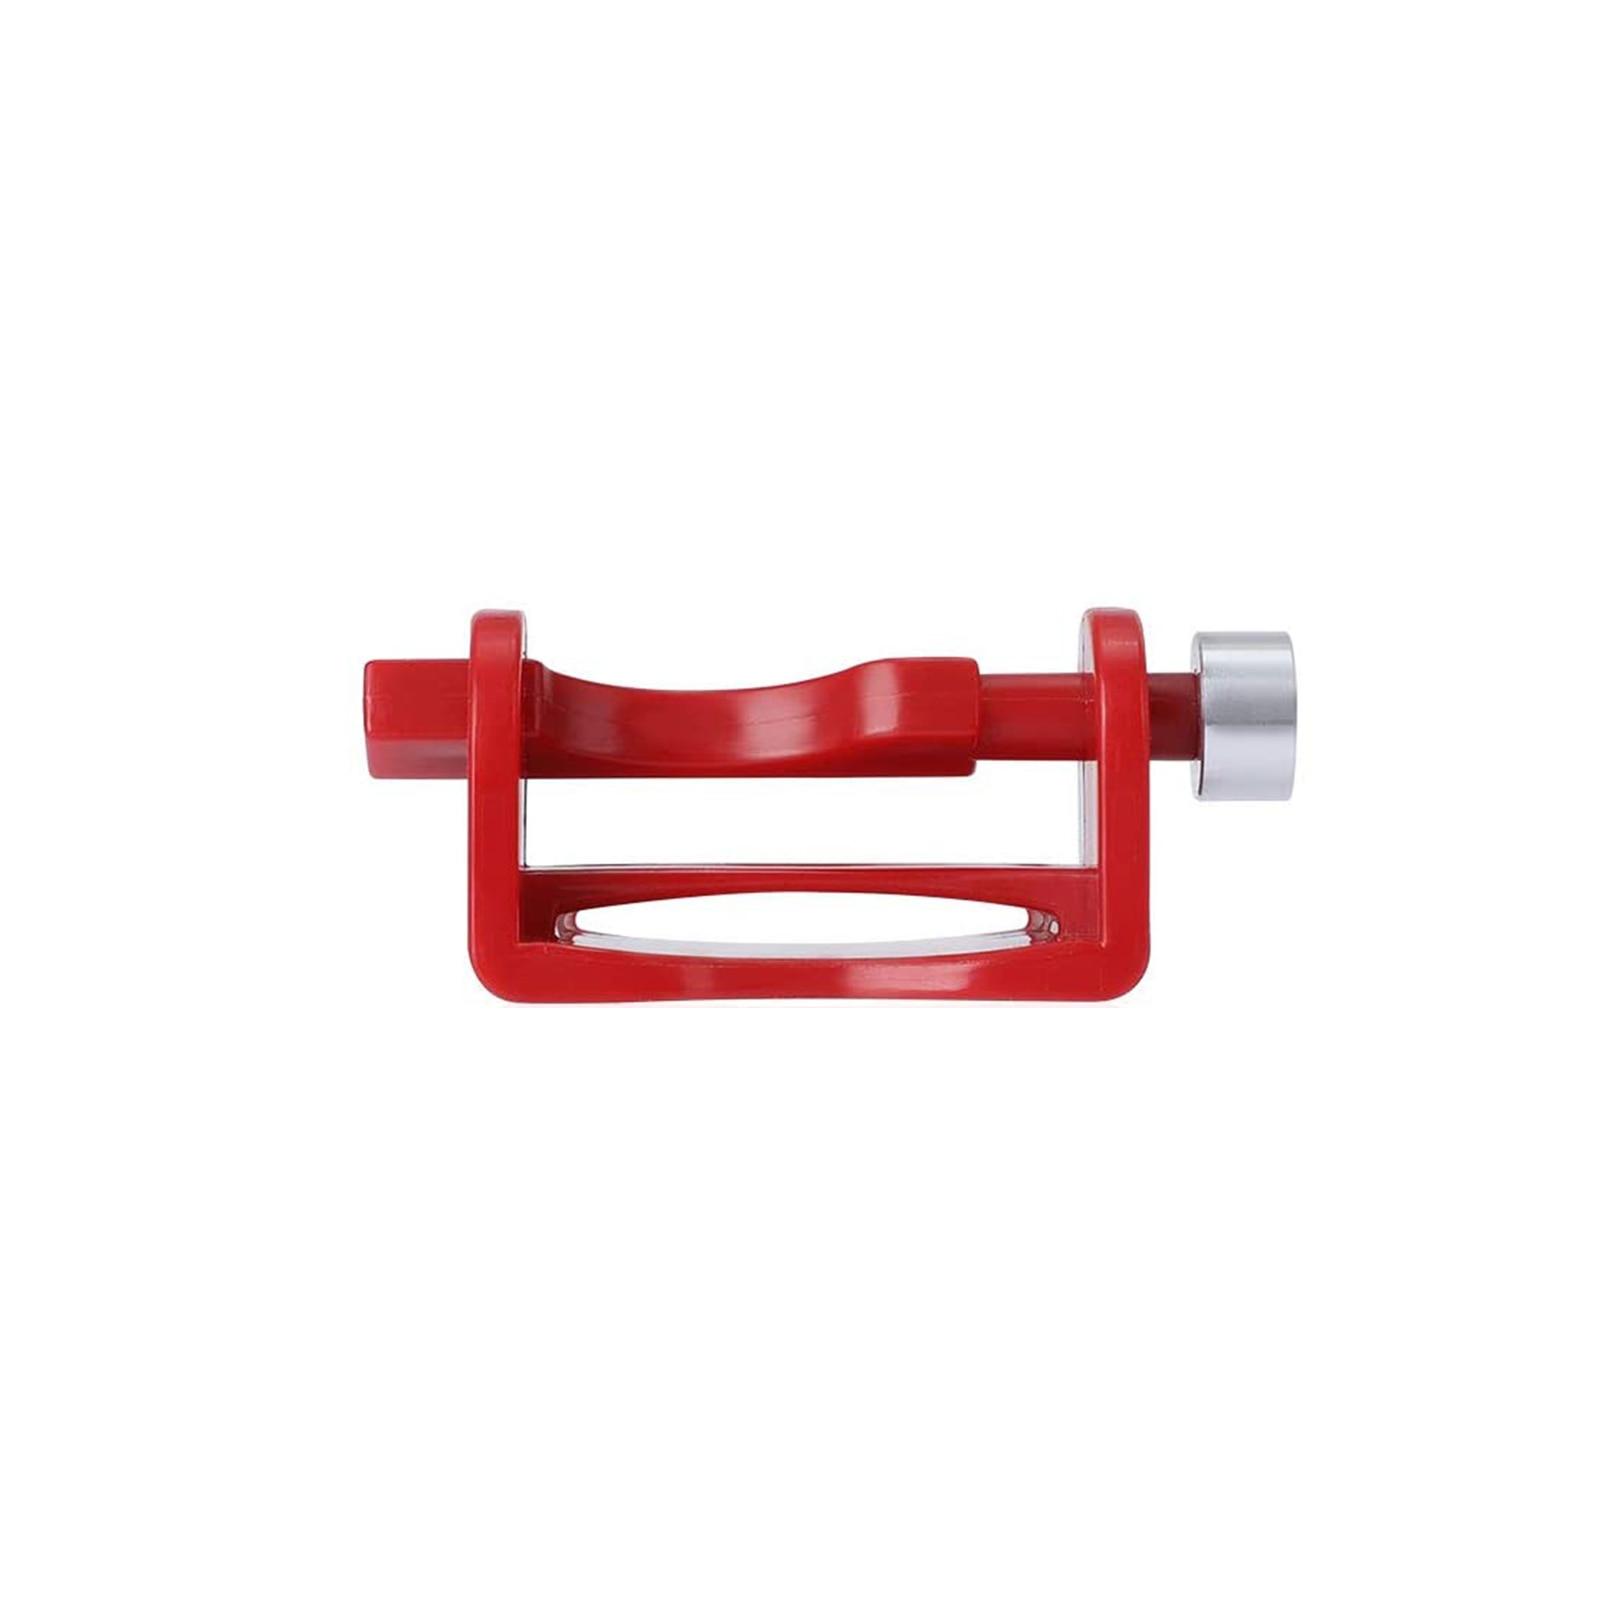 Cerradura de gatillo Para aspiradora Dyson V6, V7, V8, accesorios de bloqueo...